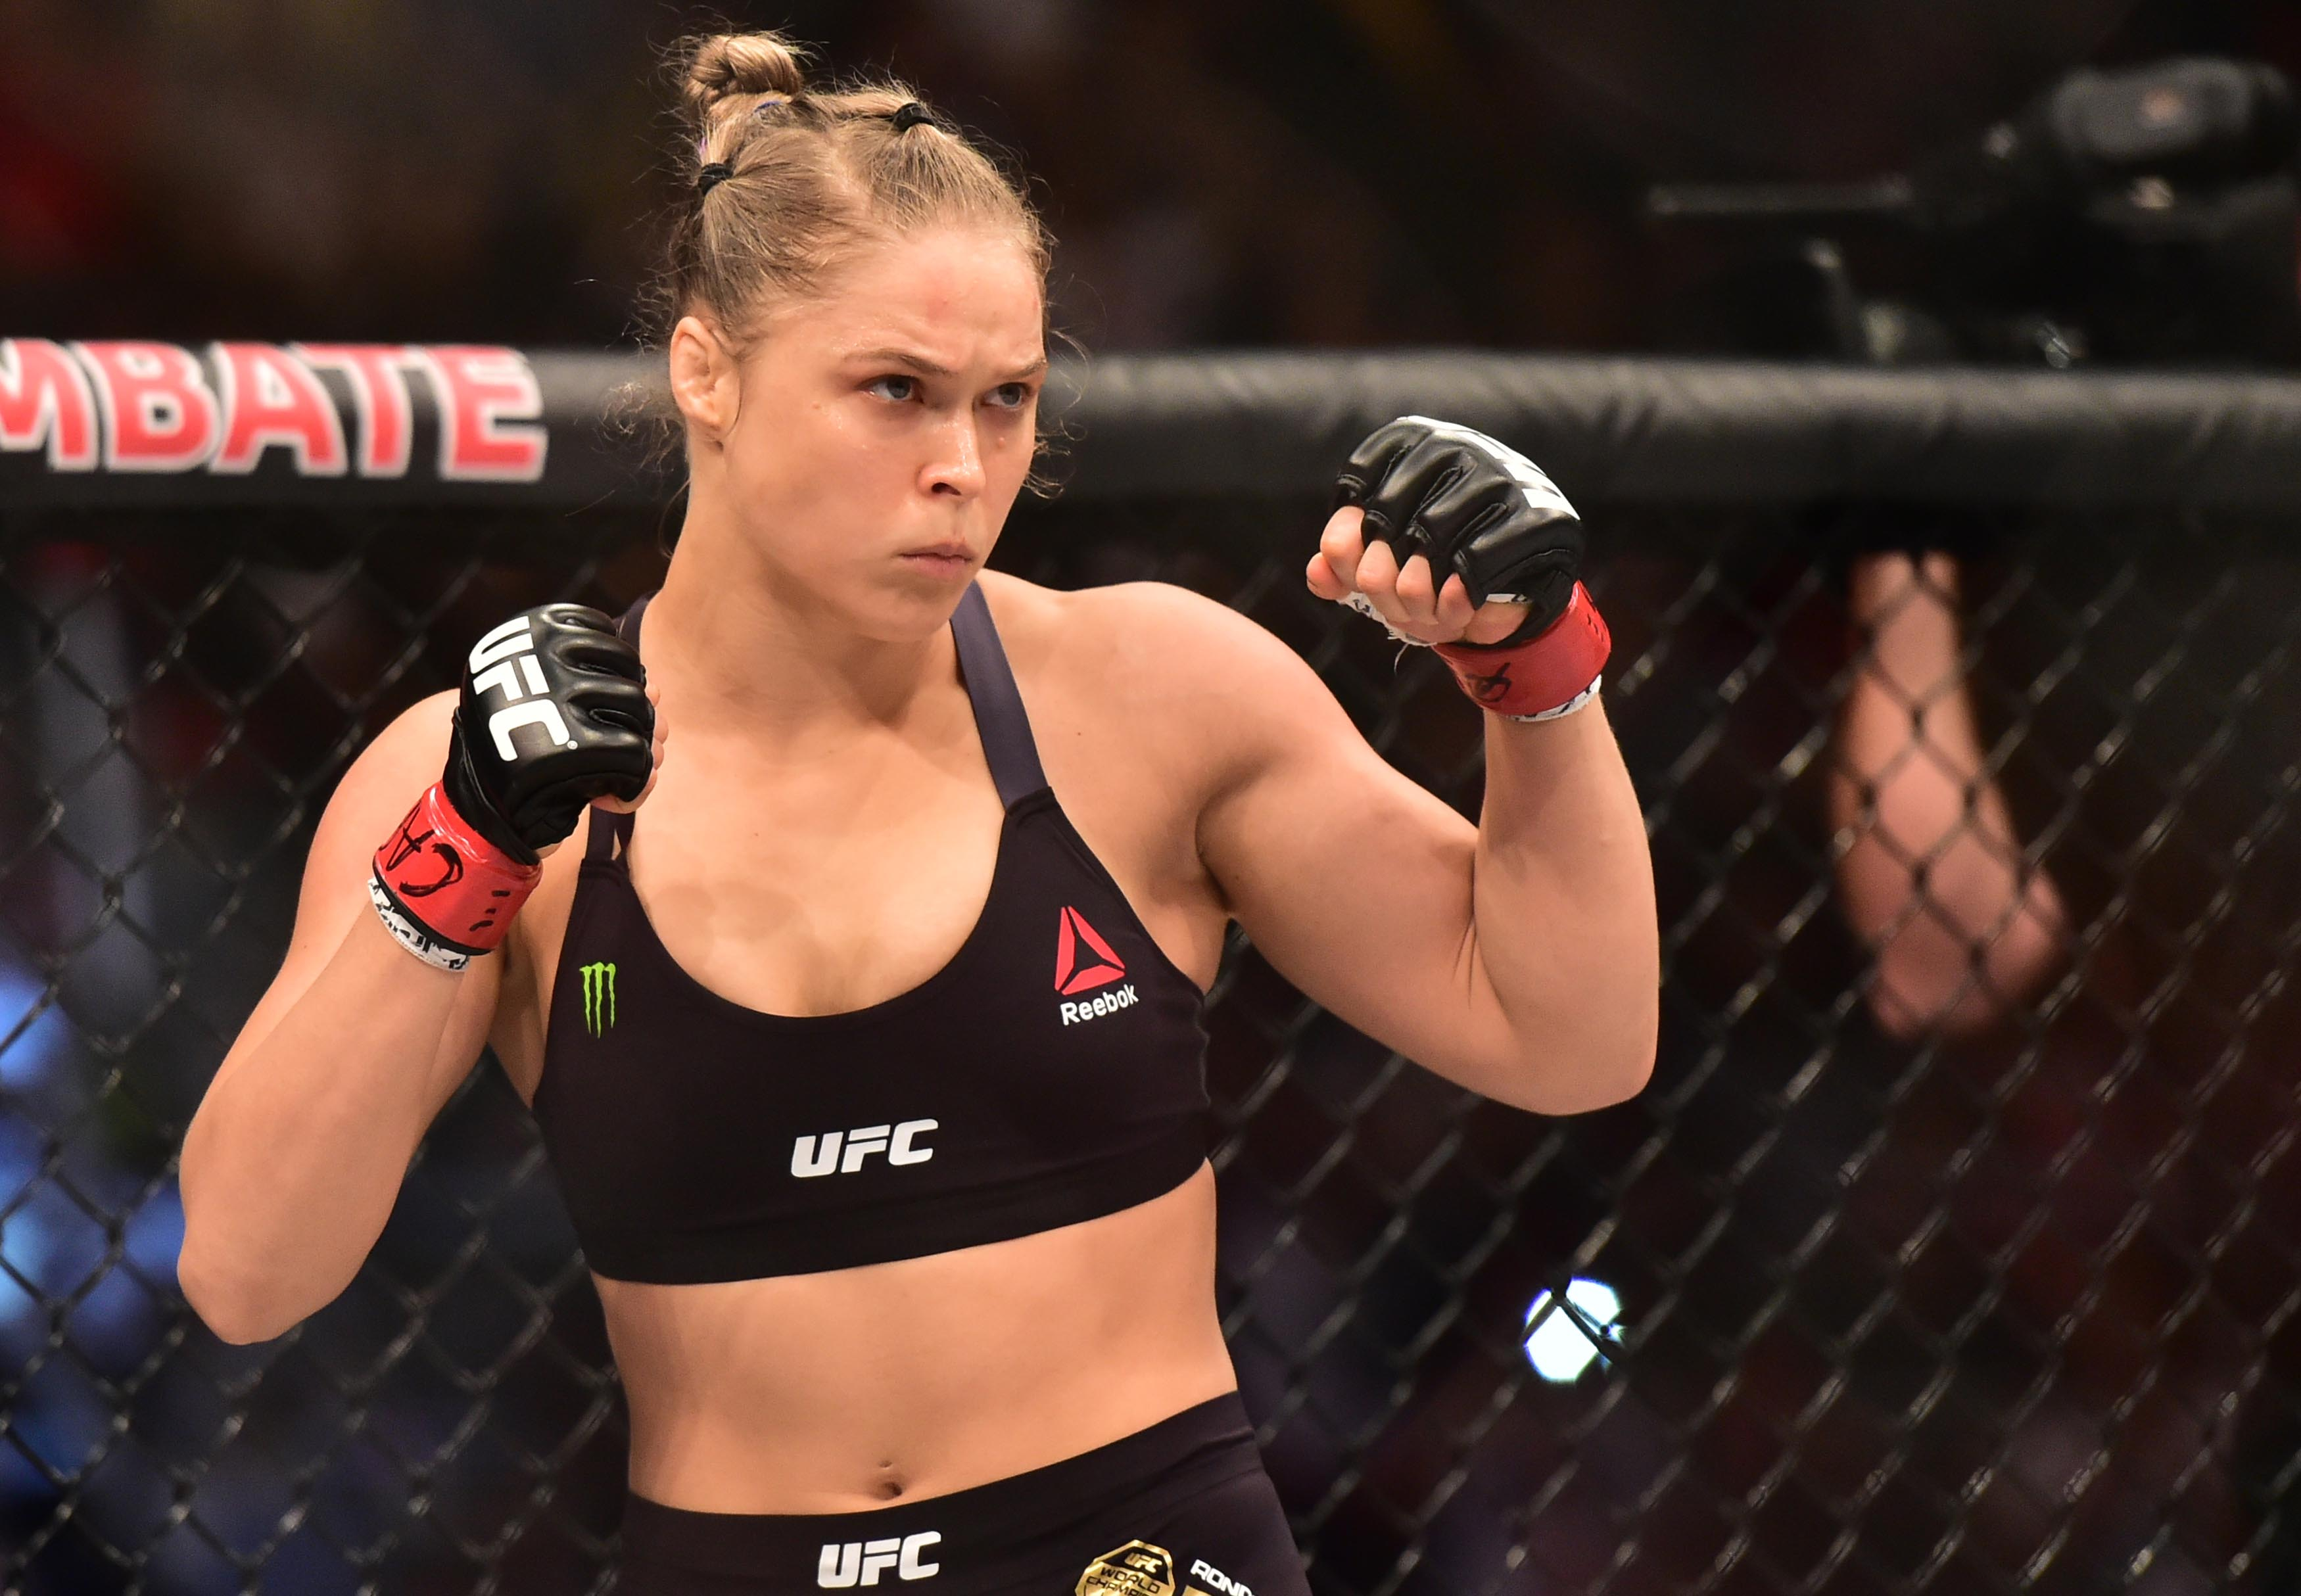 Ronda Rousey Free